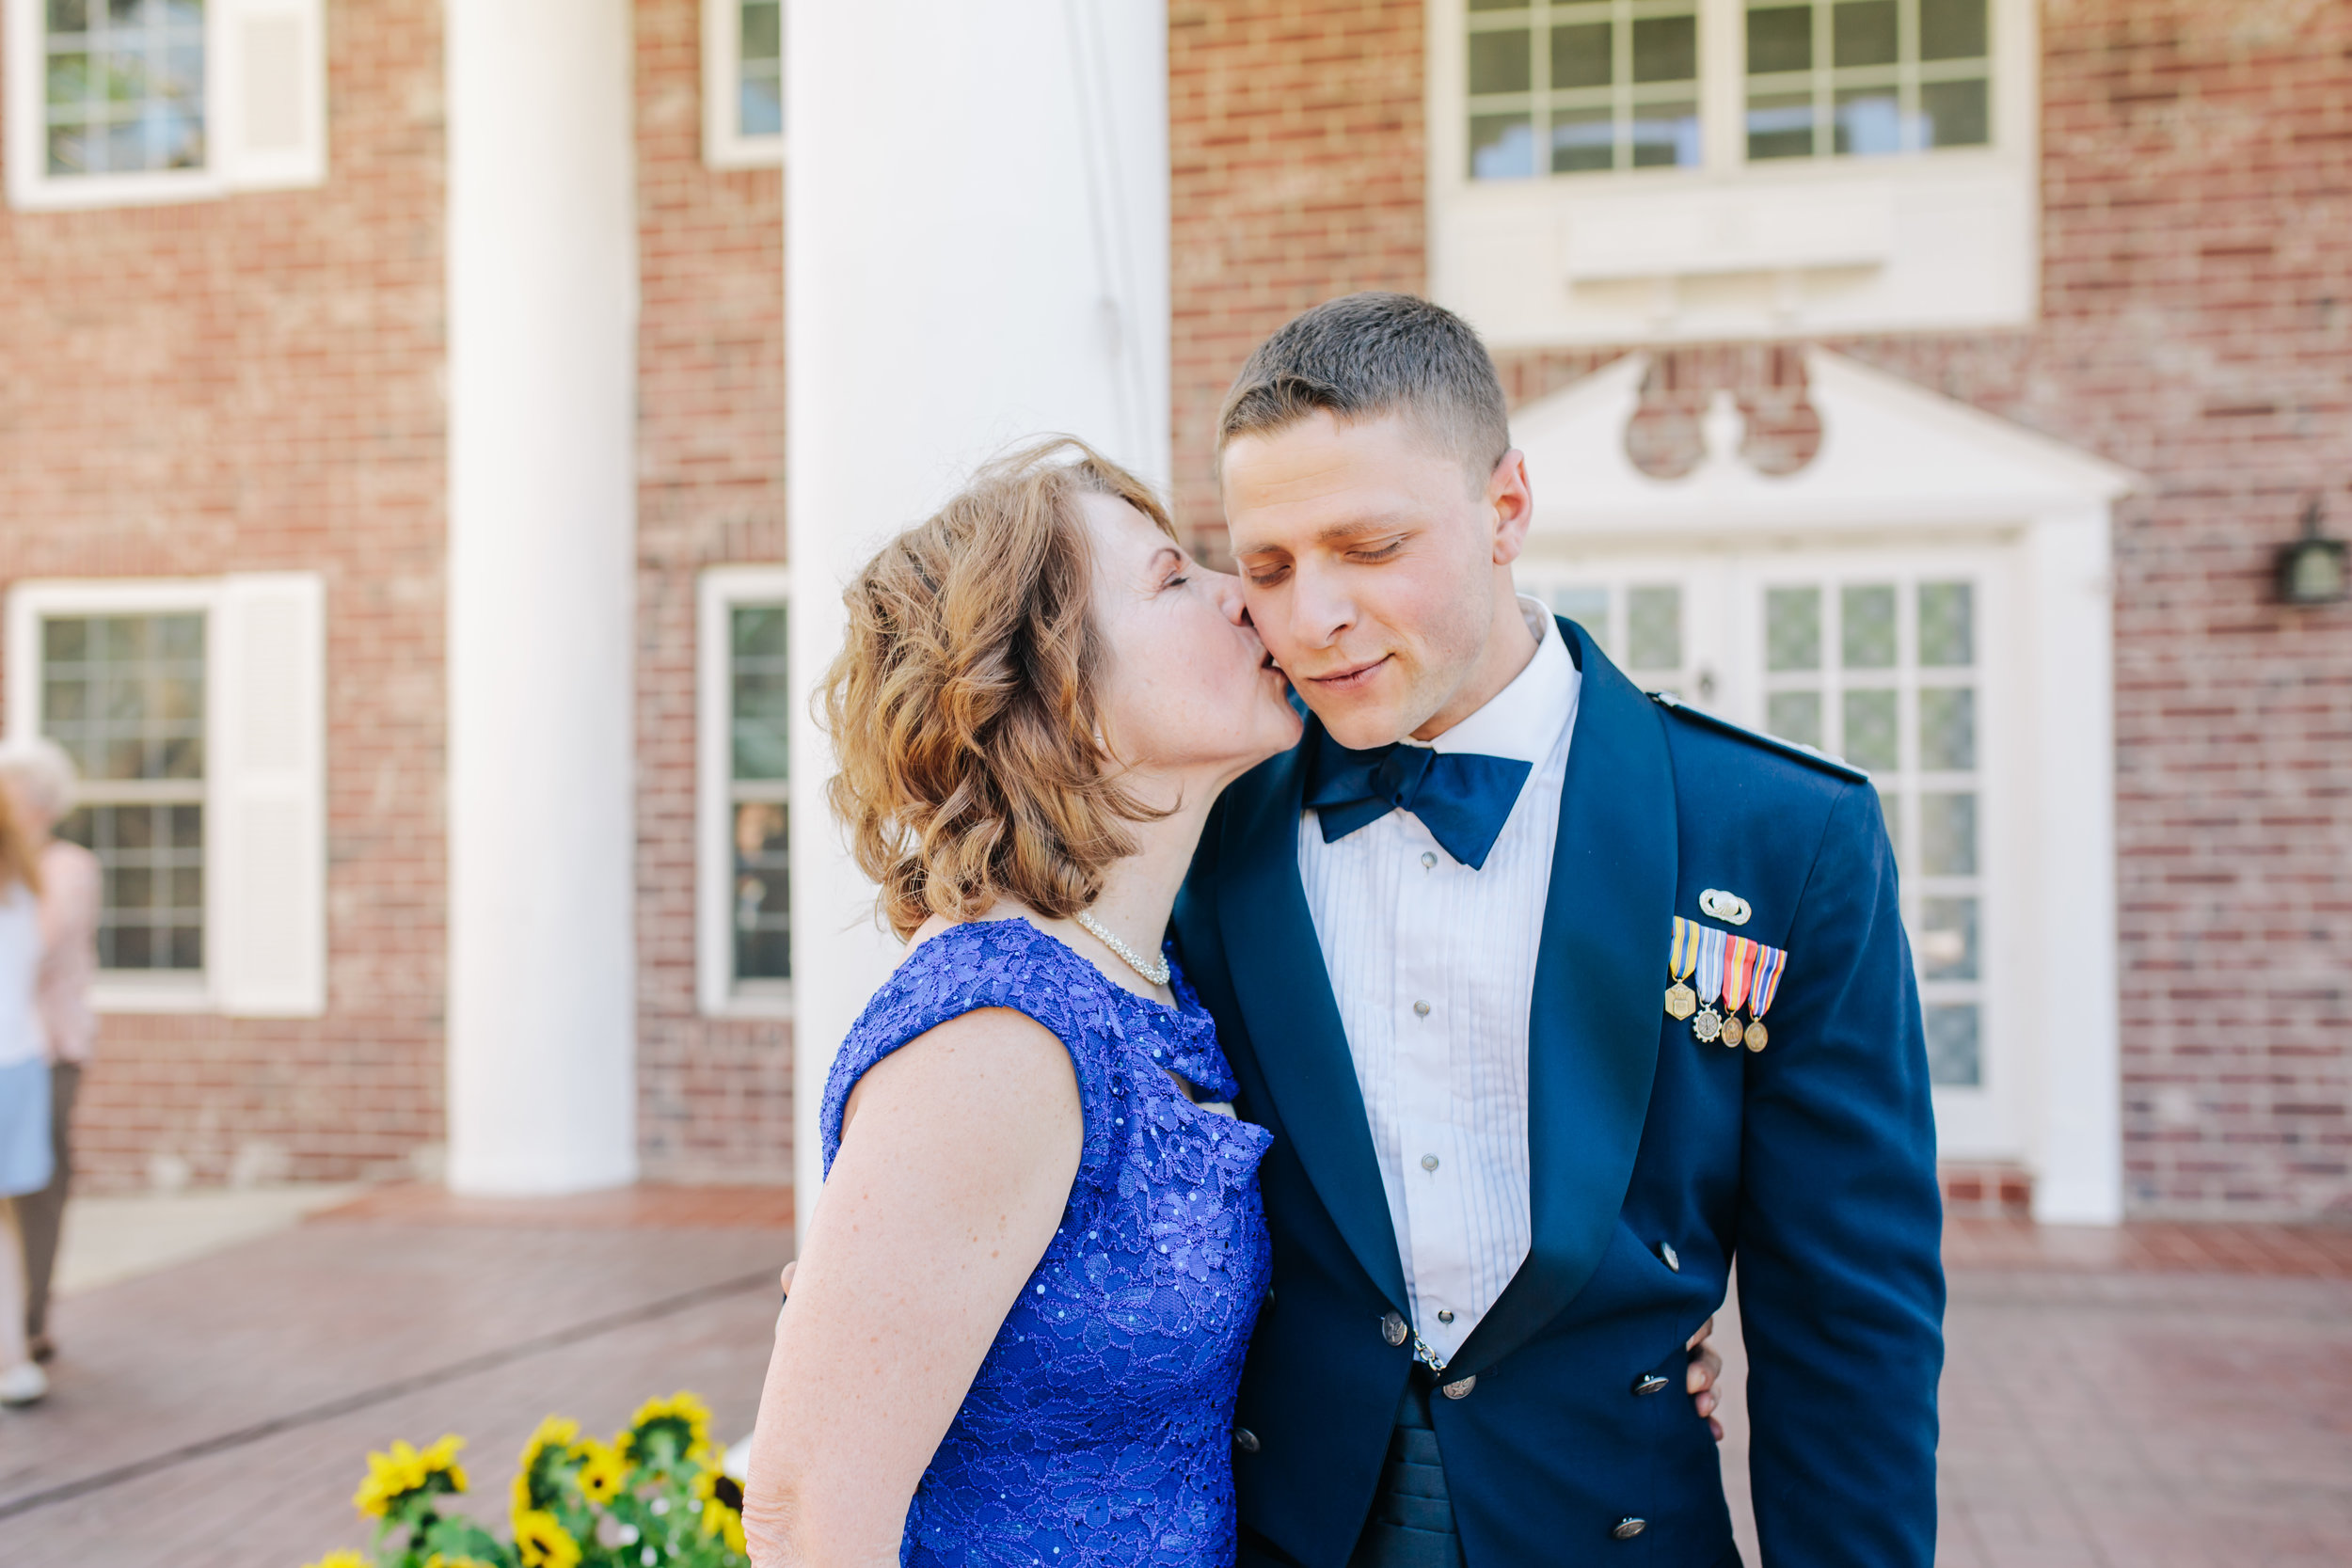 2018.03.17 Allison and Chuck Wedding Waelti Melbourne (428 of 569).jpg